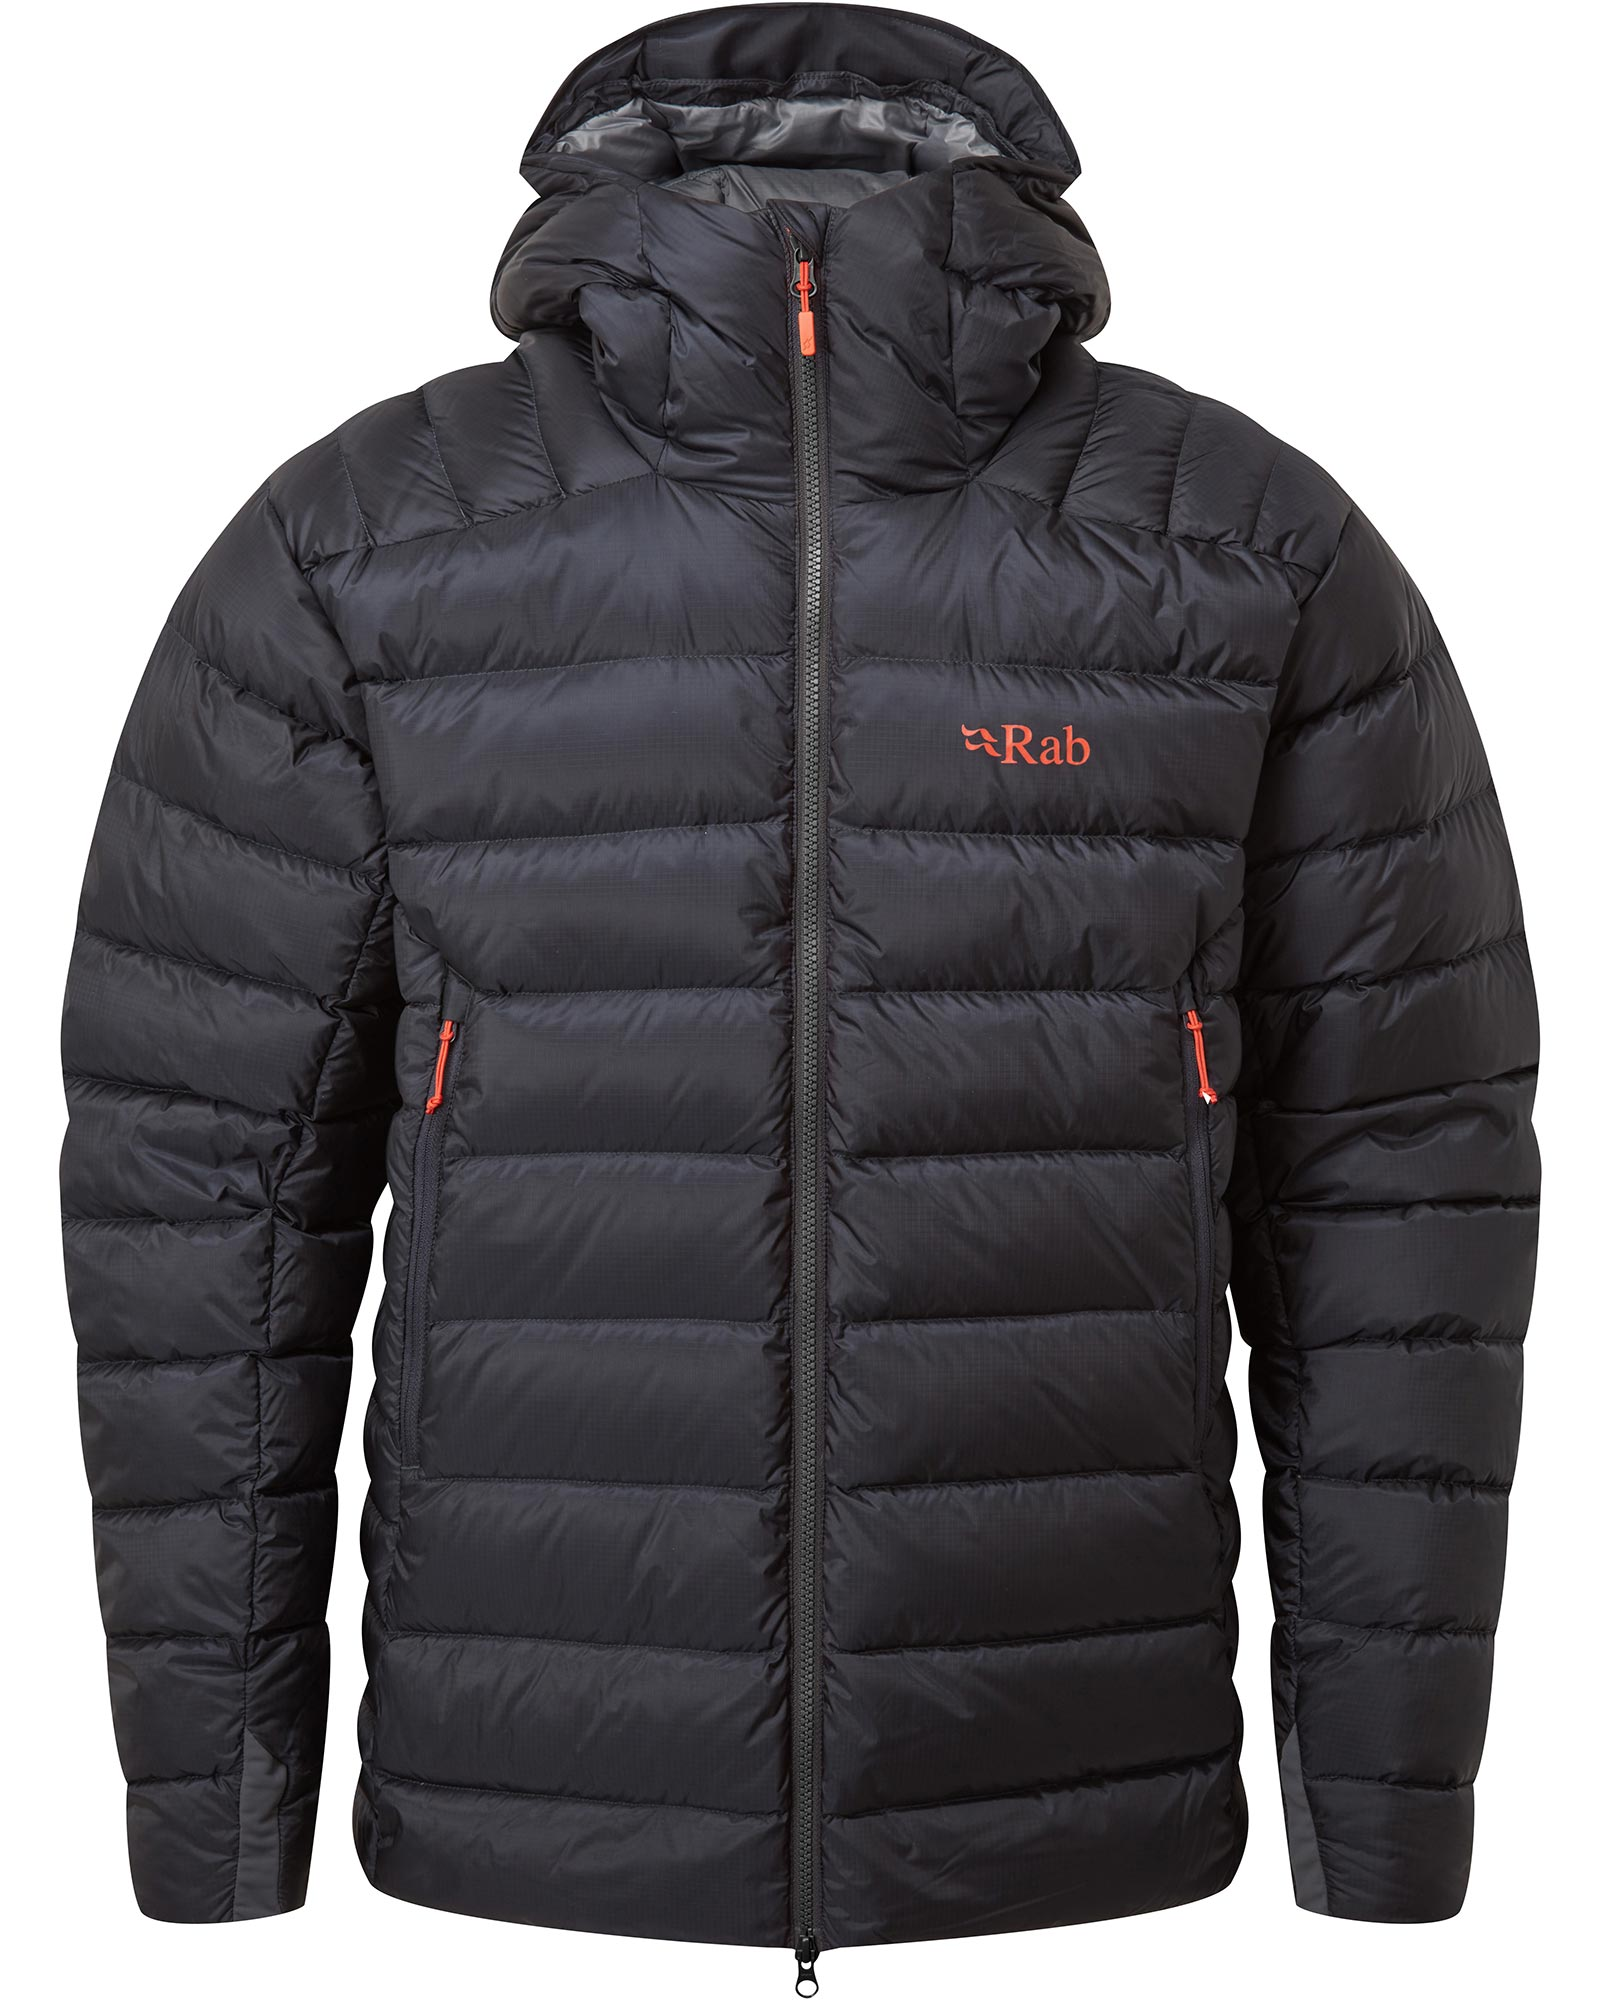 Rab Men's Electron Pro Jacket 0